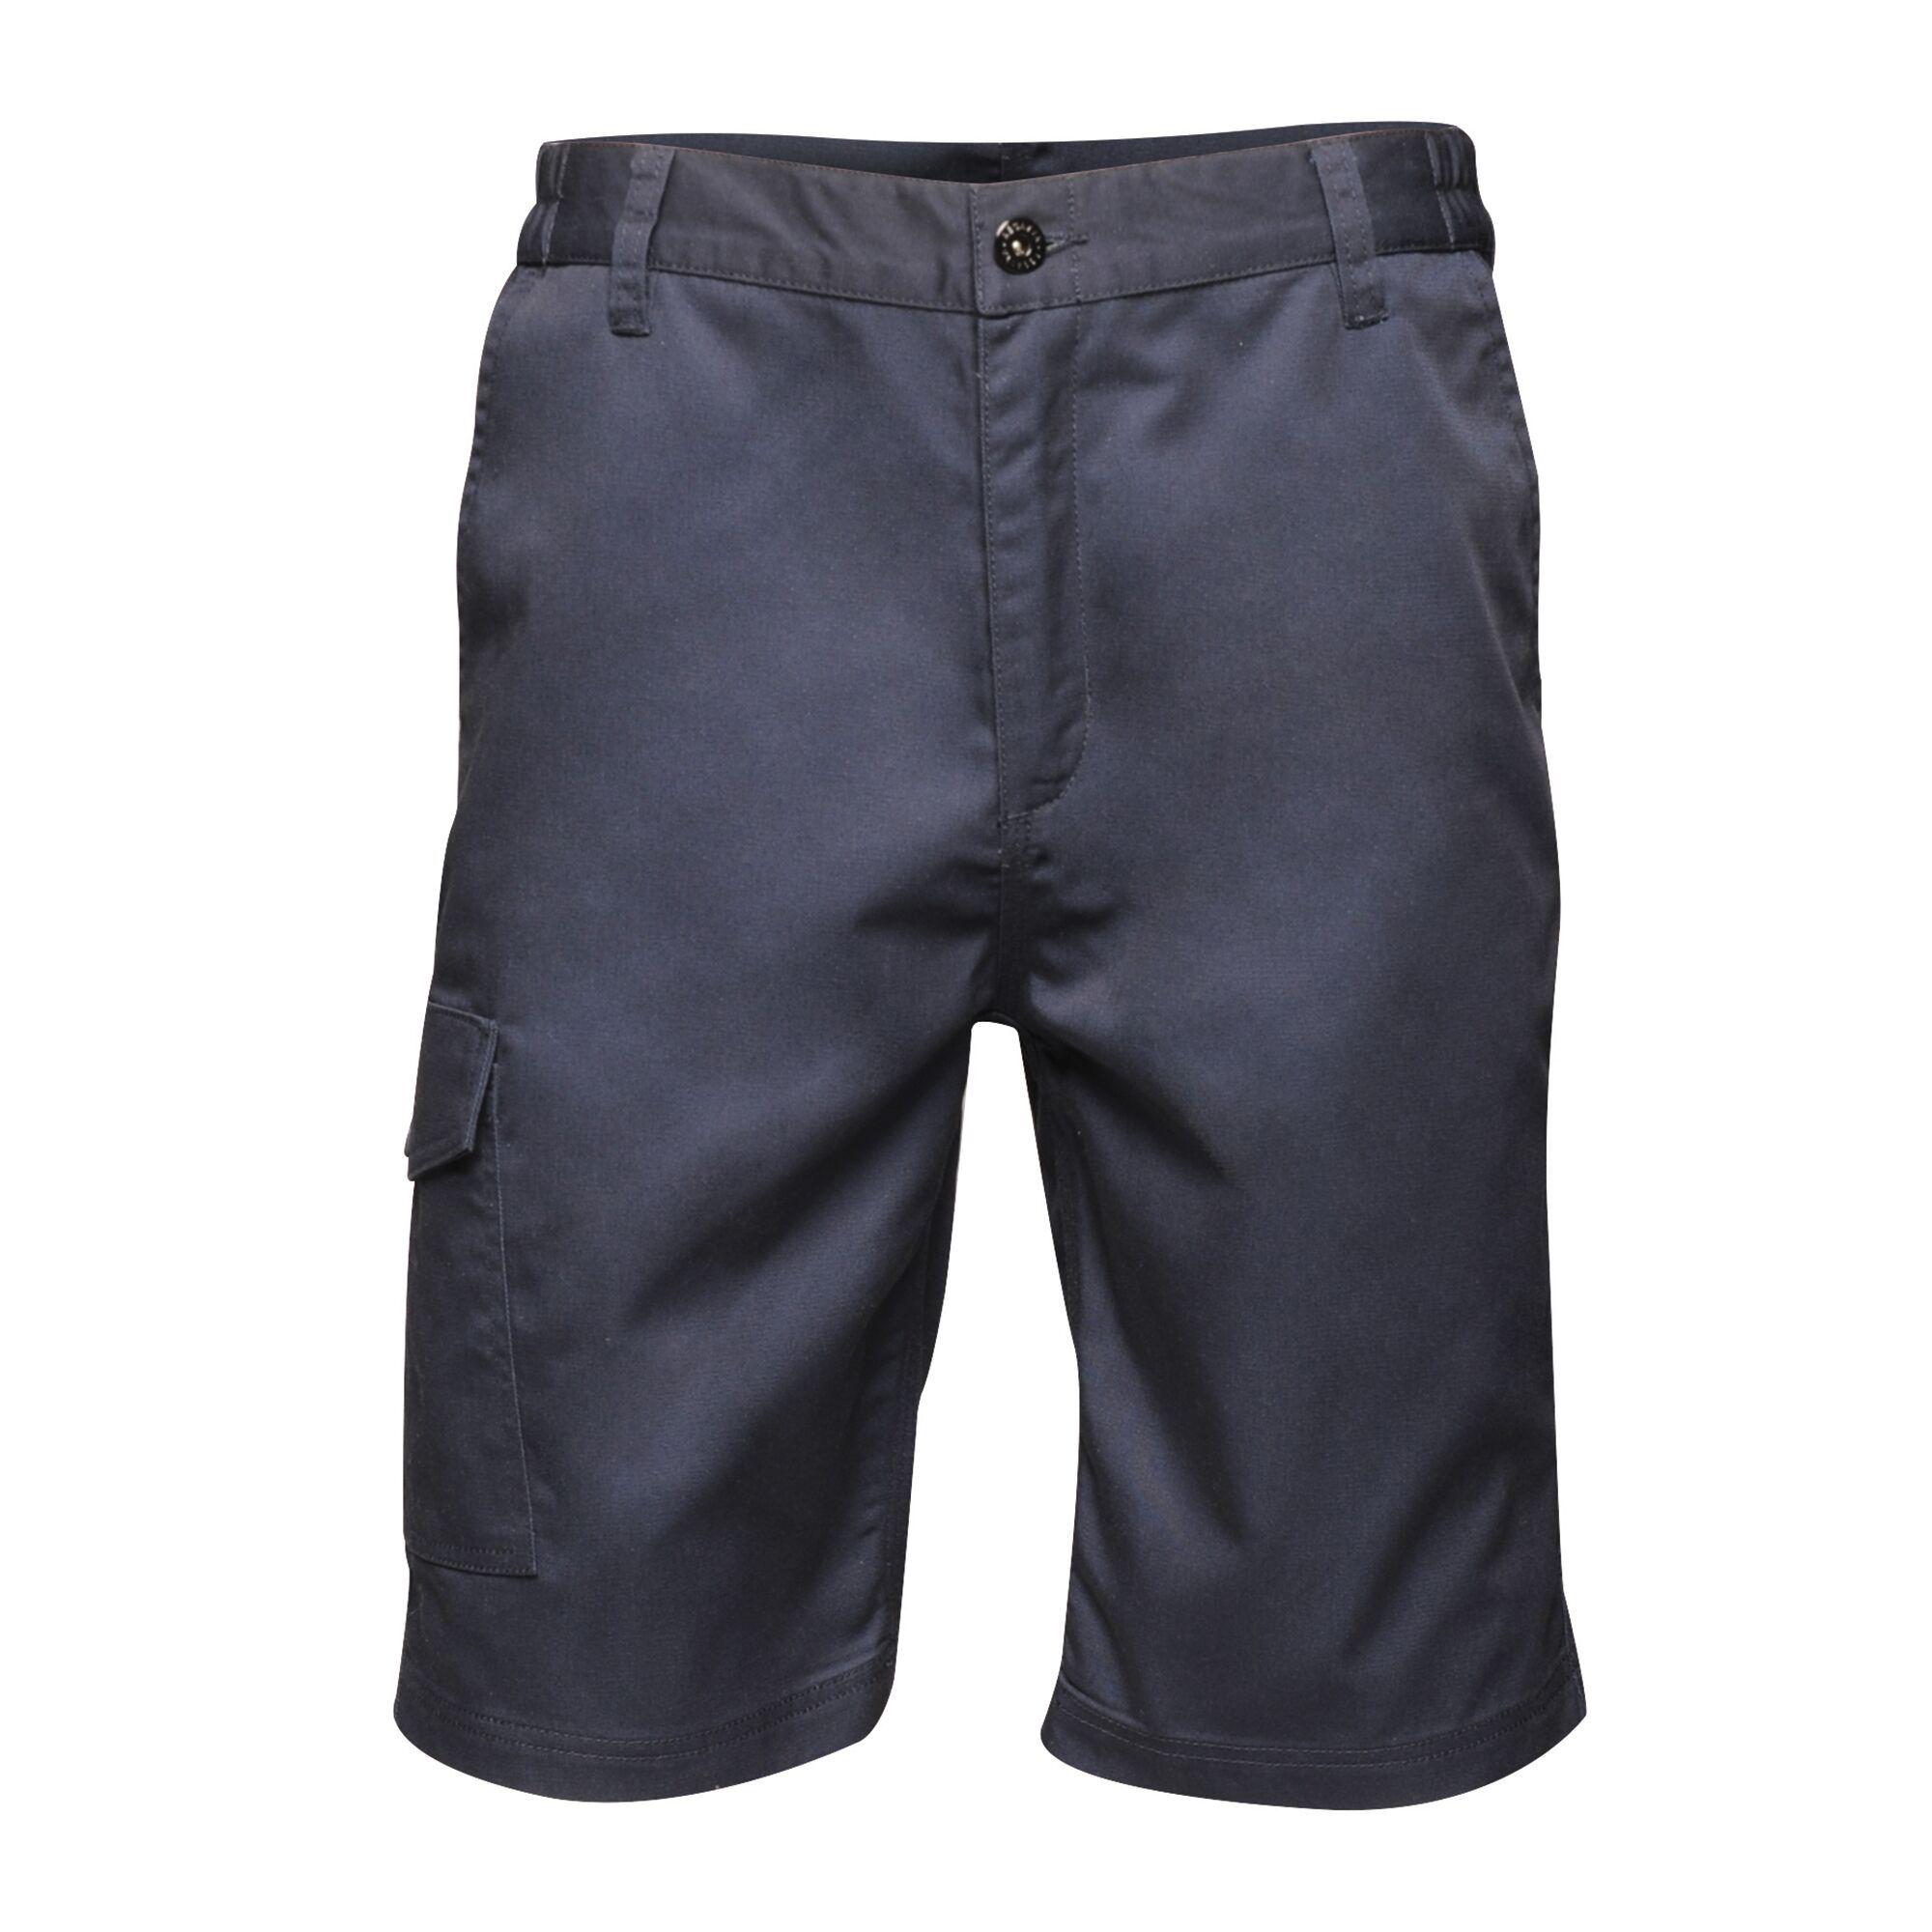 Men's Pro Cargo Shorts Navy